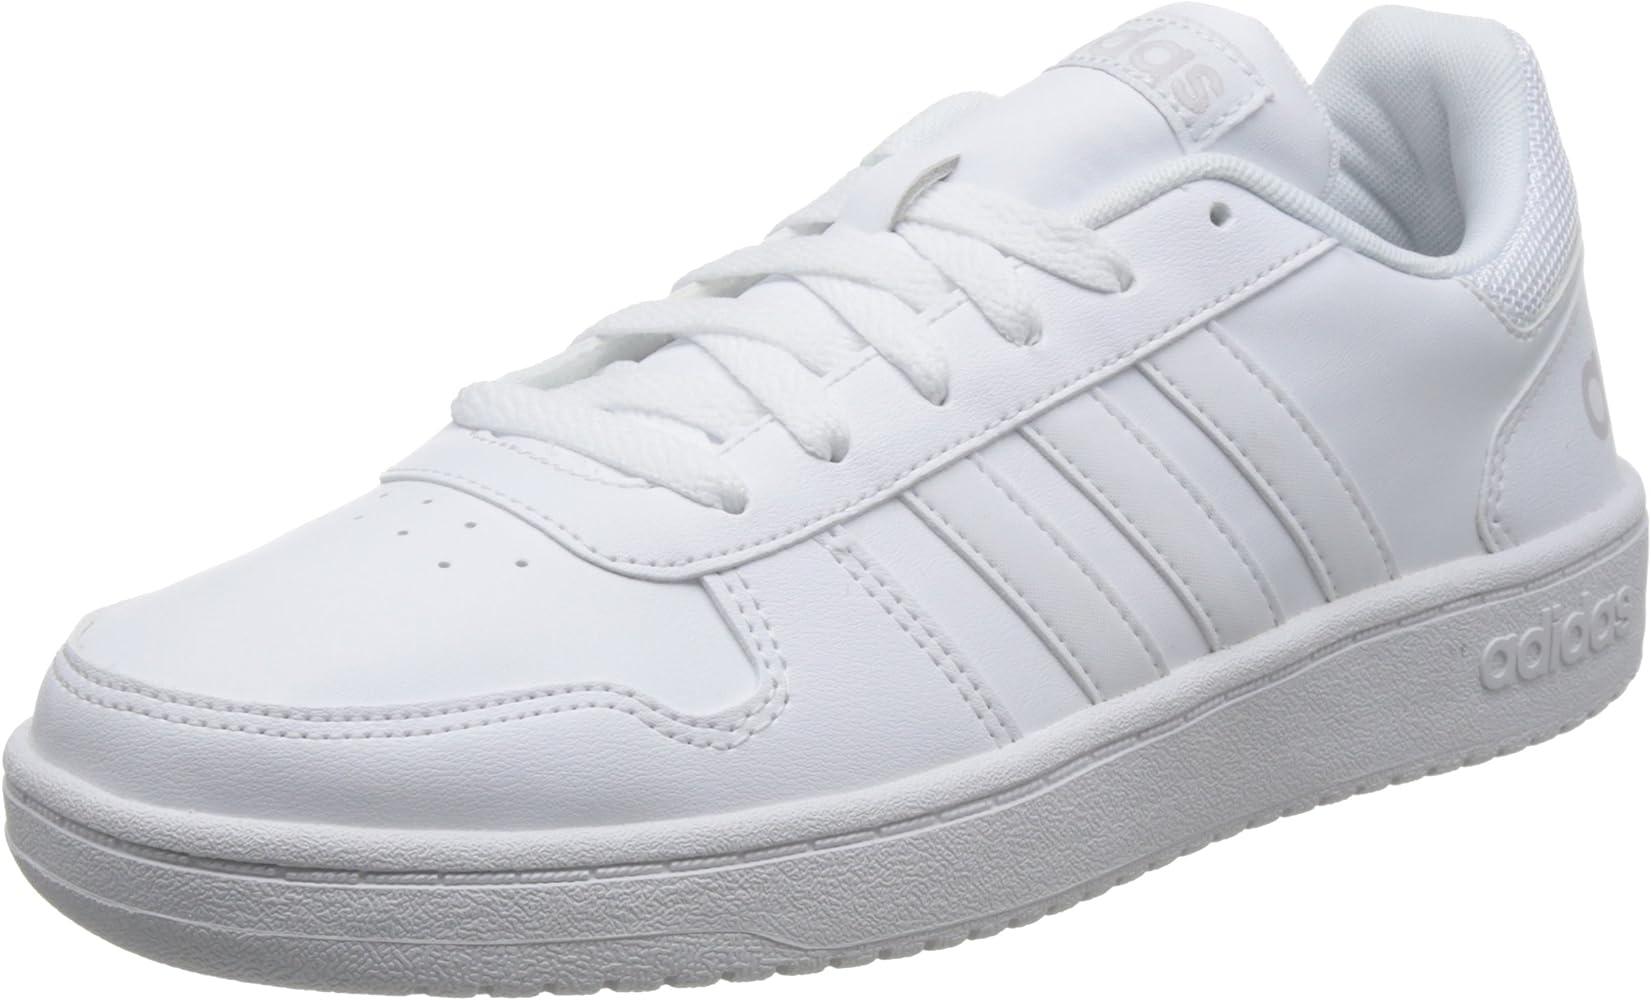 adidas Men's Hoops 2.0 Basketball Shoes, White